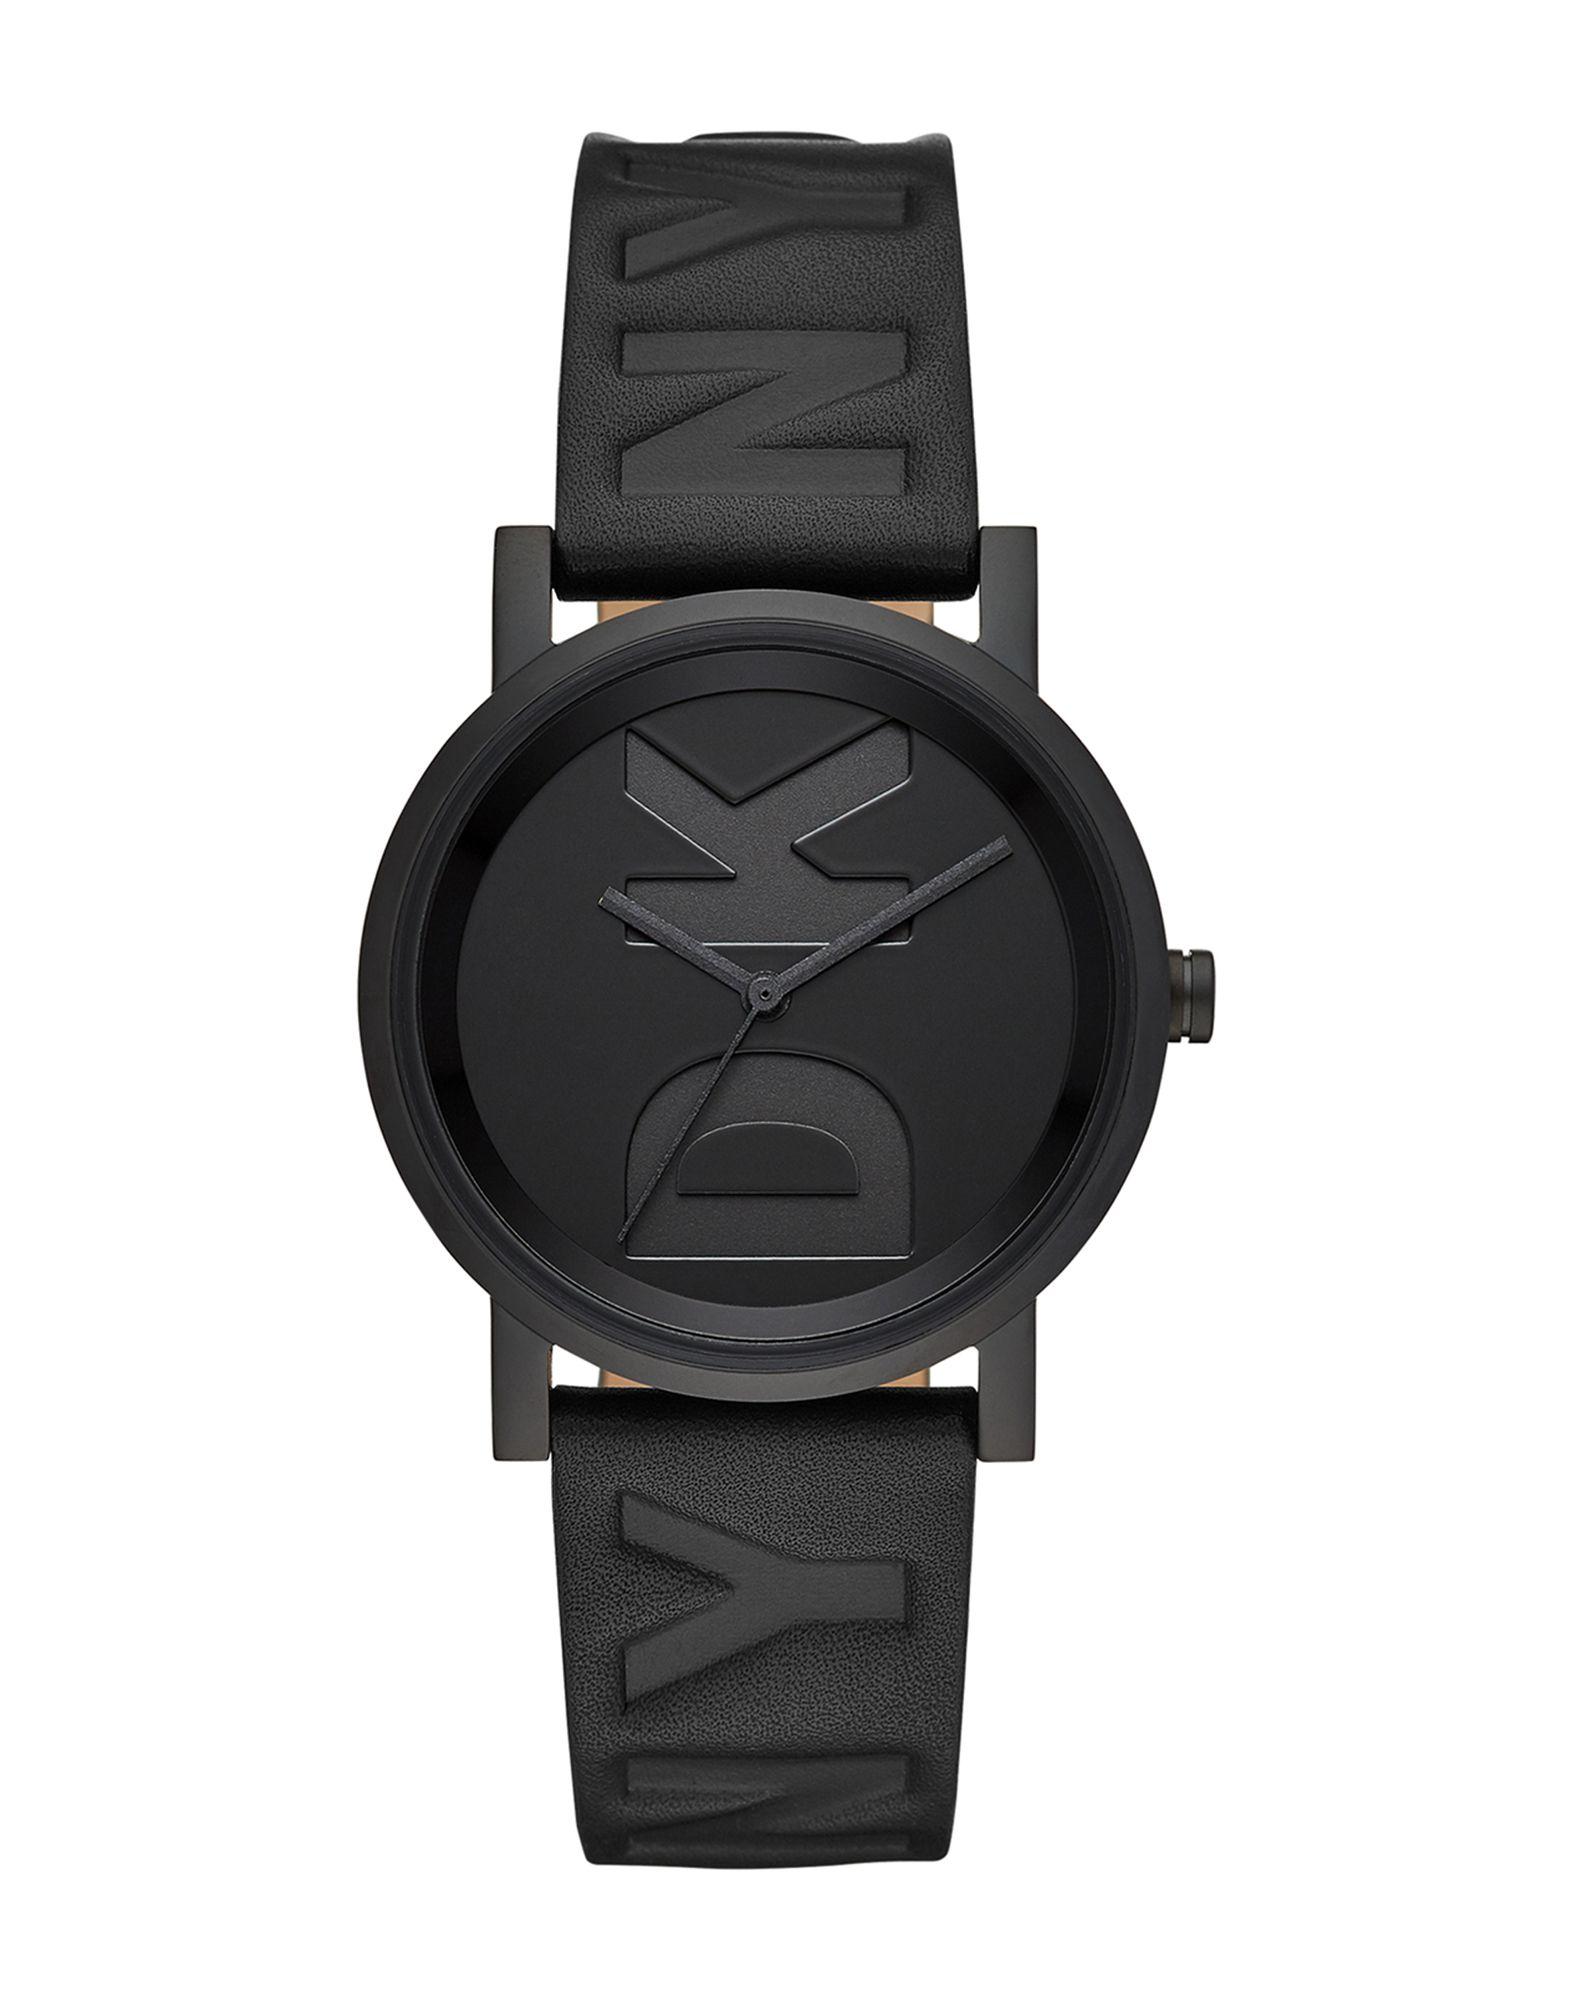 Фото - DKNY Наручные часы обувь на высокой платформе dkny